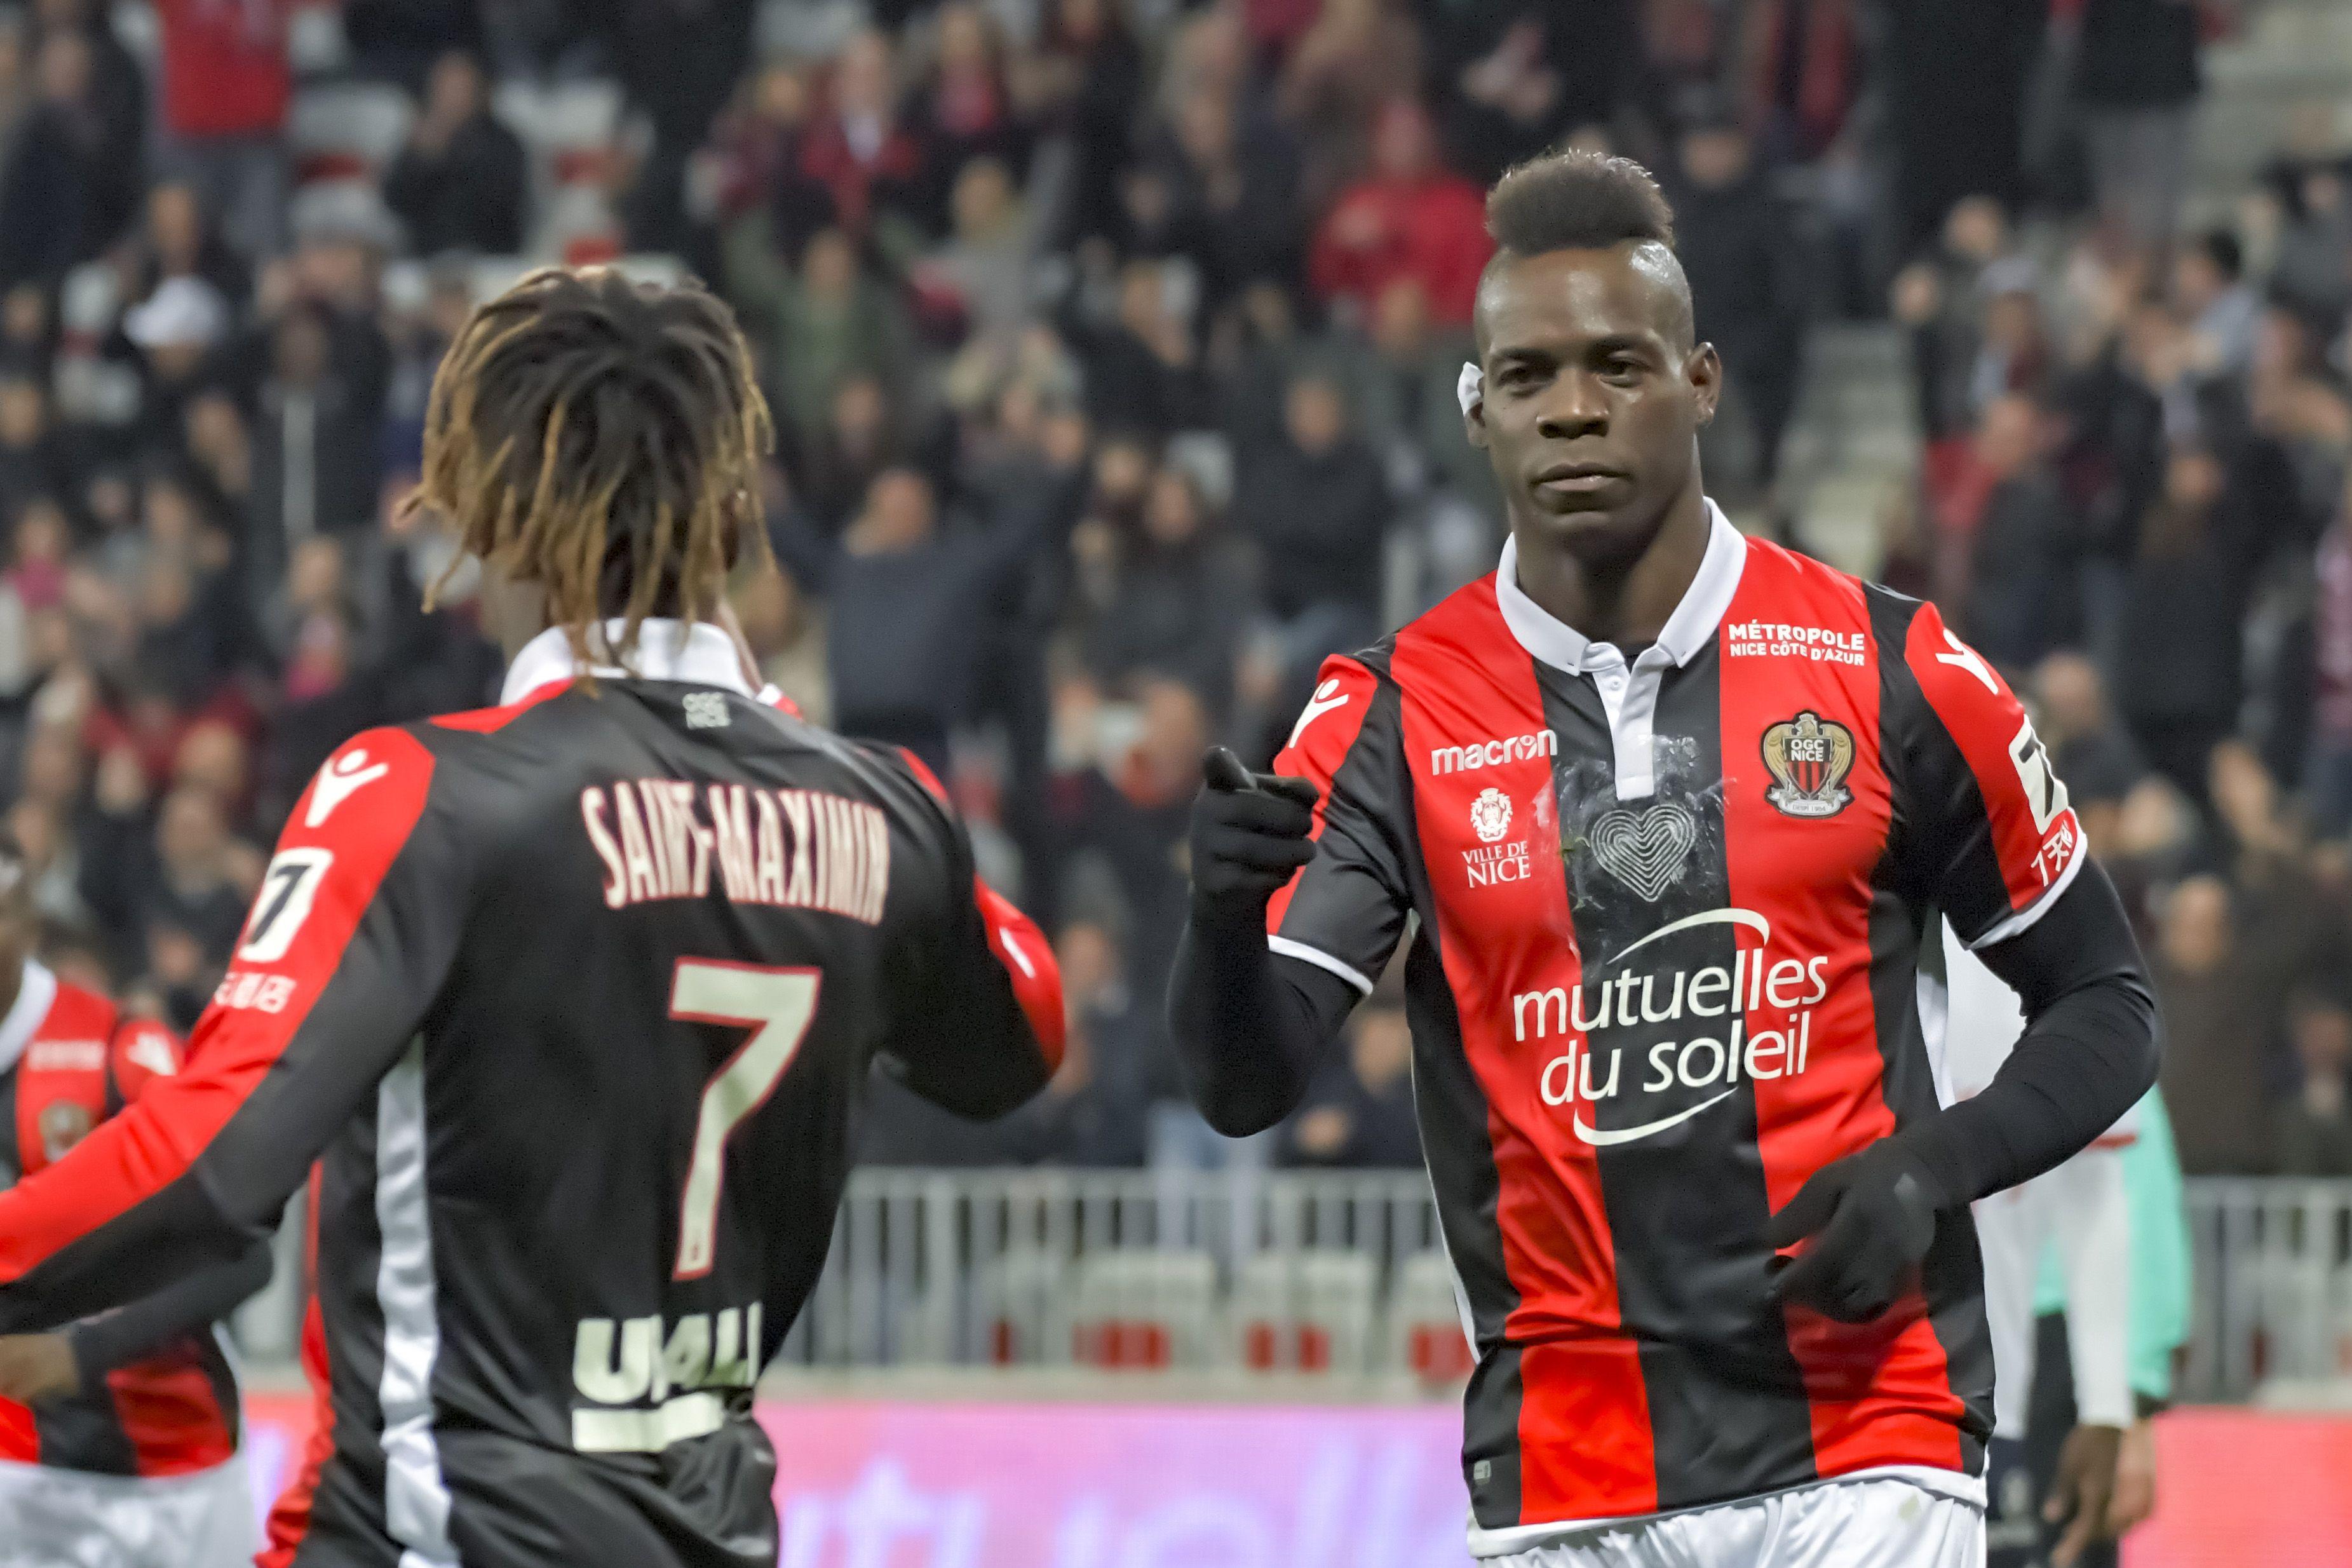 Football - Ligue 1 - PSG, Metz, Balotelli : les chiffres marquants du week-end de L1